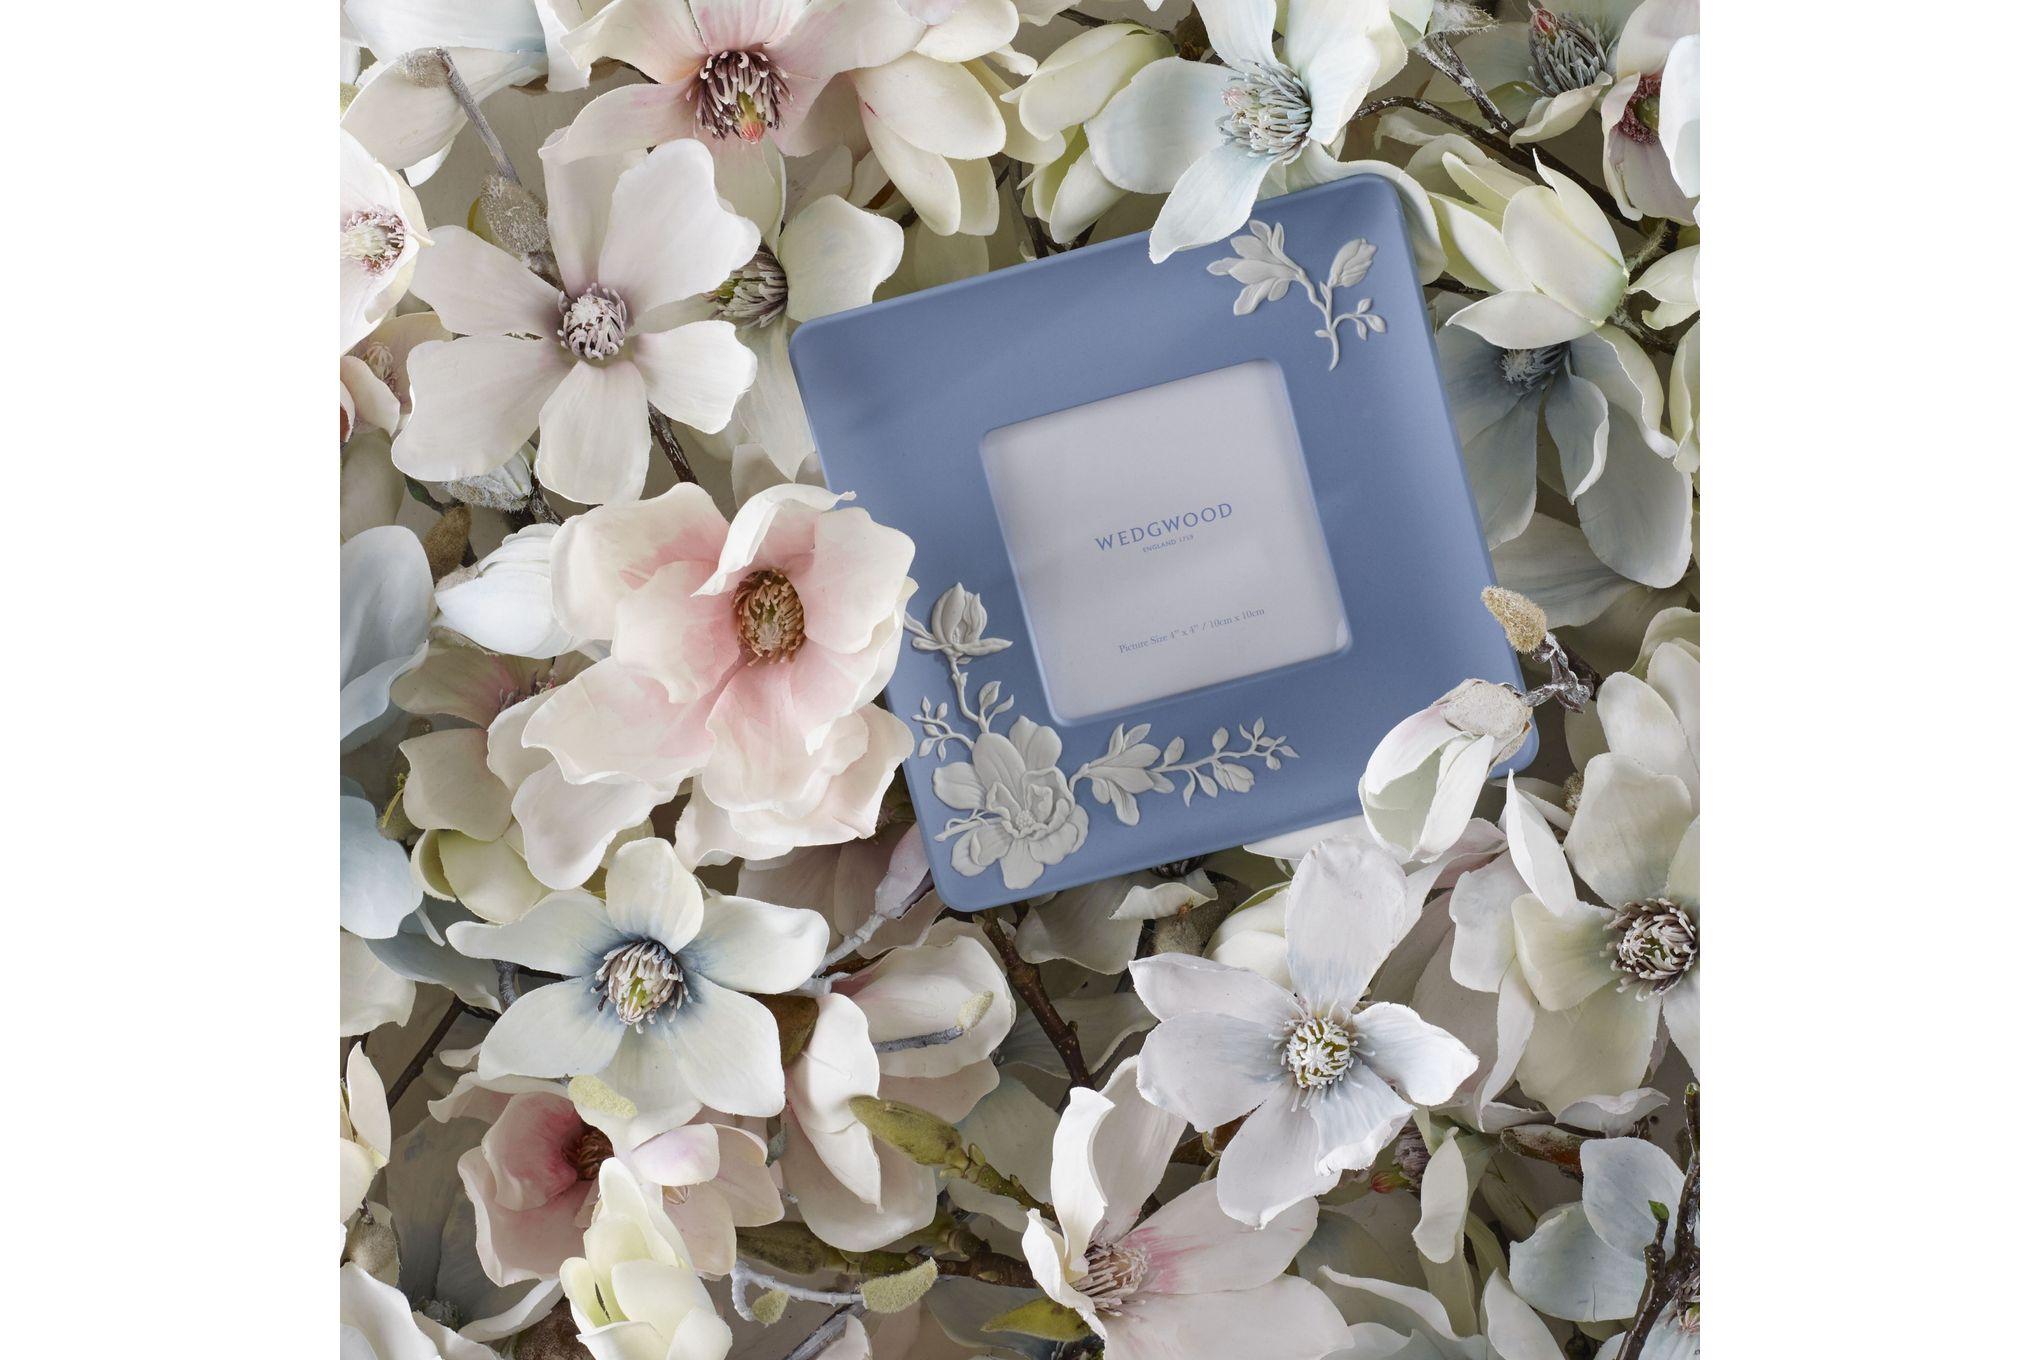 "Wedgwood Magnolia Blossom Photo Frame 4 x 4"" thumb 2"